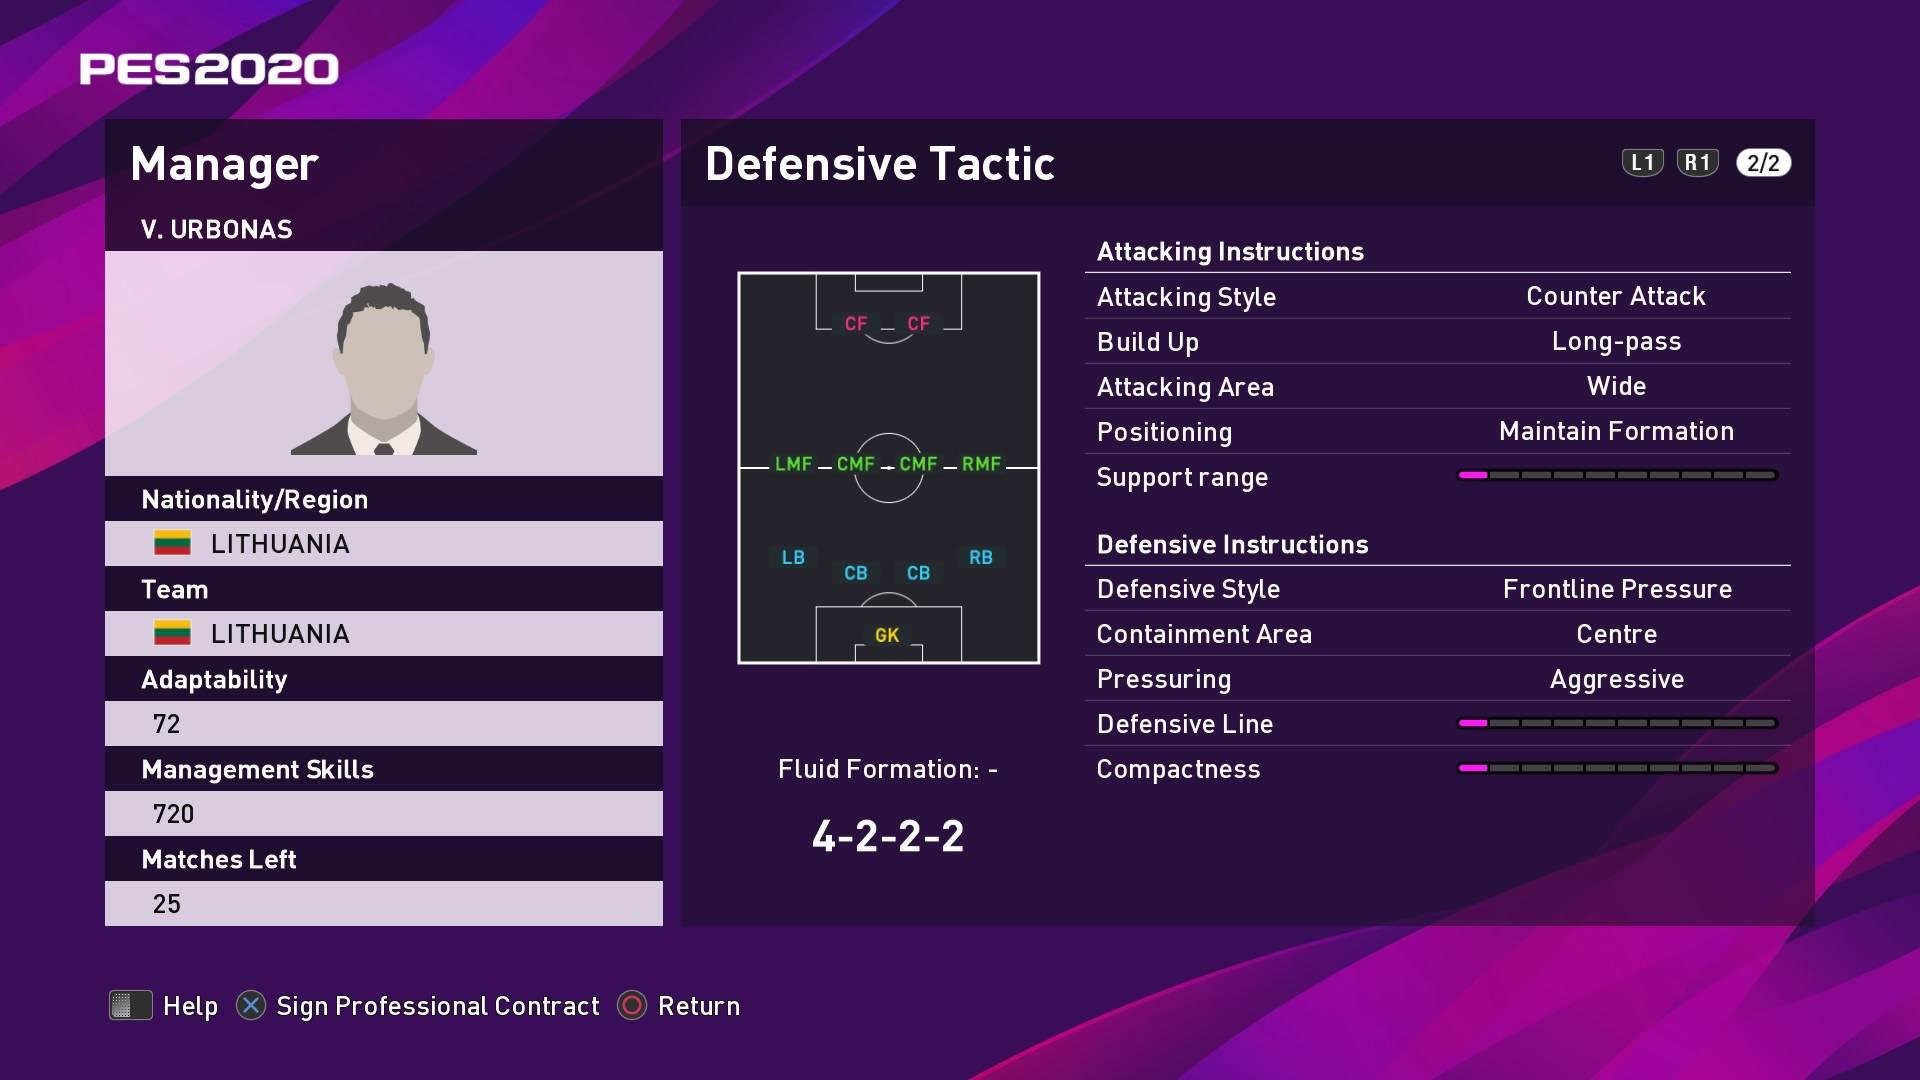 V. Urbonas (Valdas Urbonas) Defensive Tactic in PES 2020 myClub